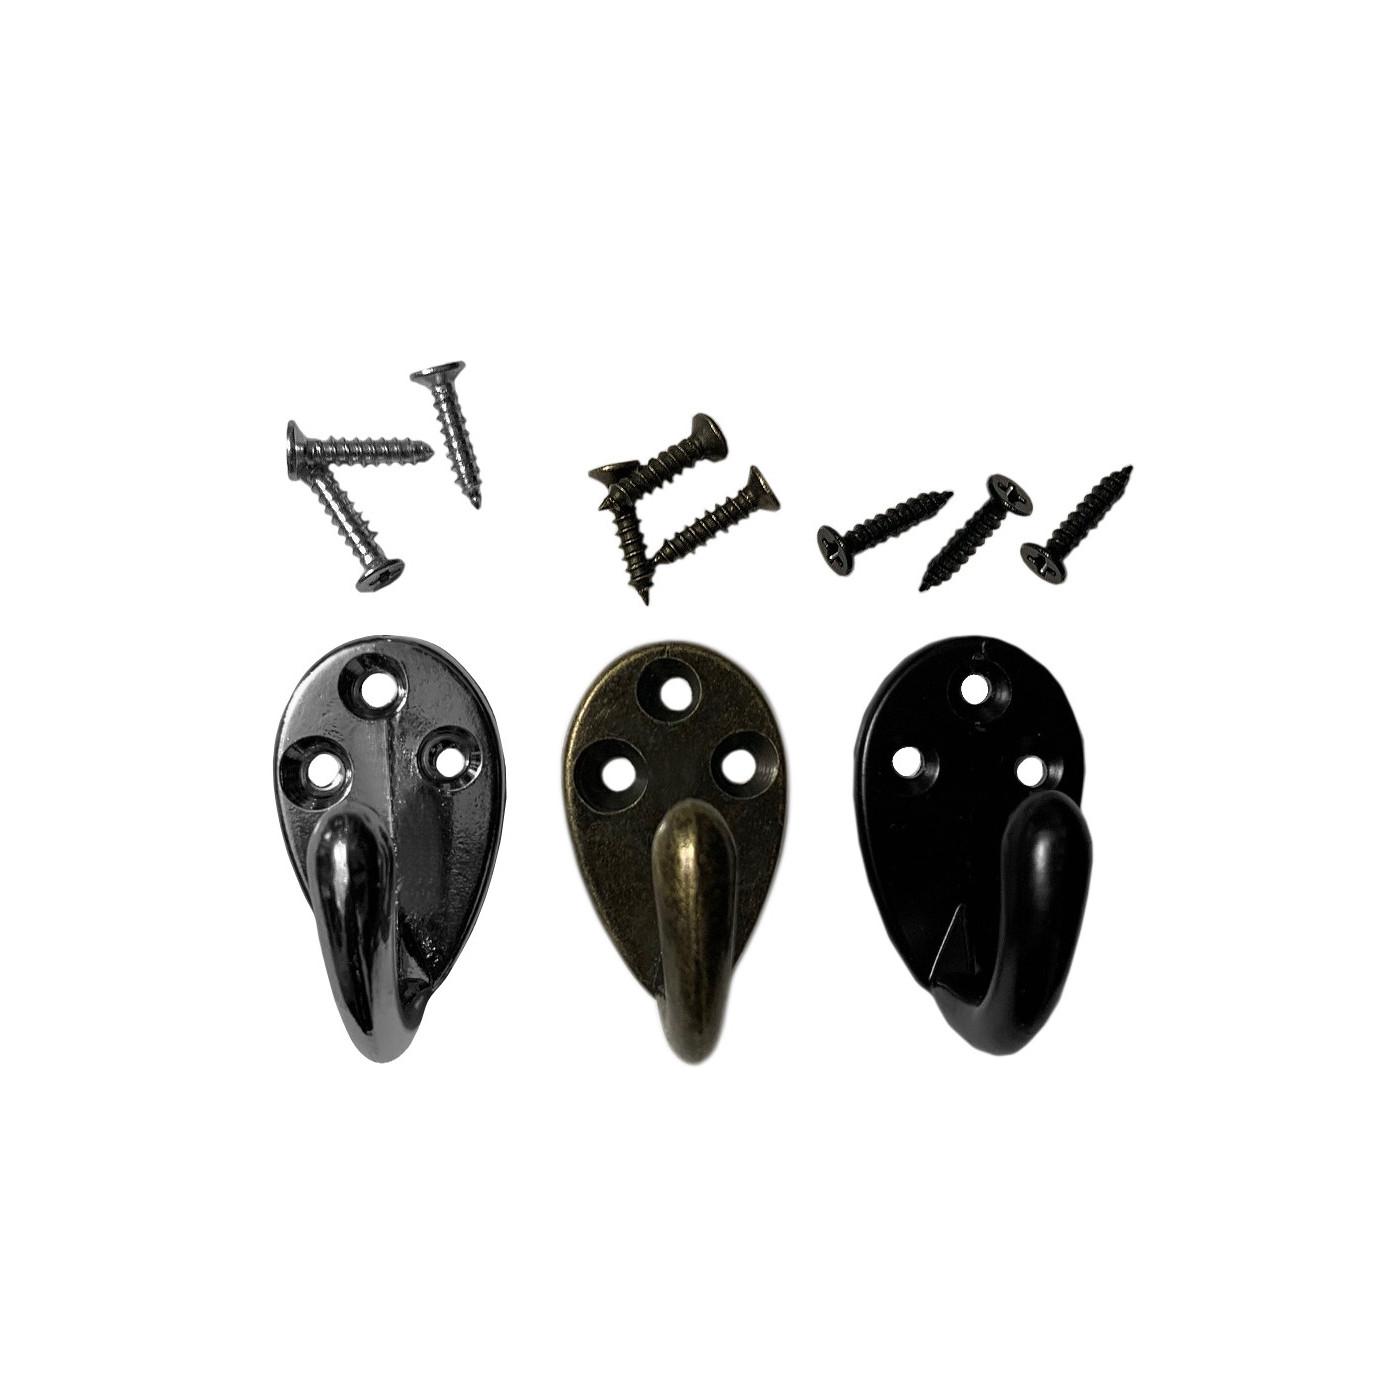 Set of 6 small metal clothes hooks, coat hangers (color: black)  - 1